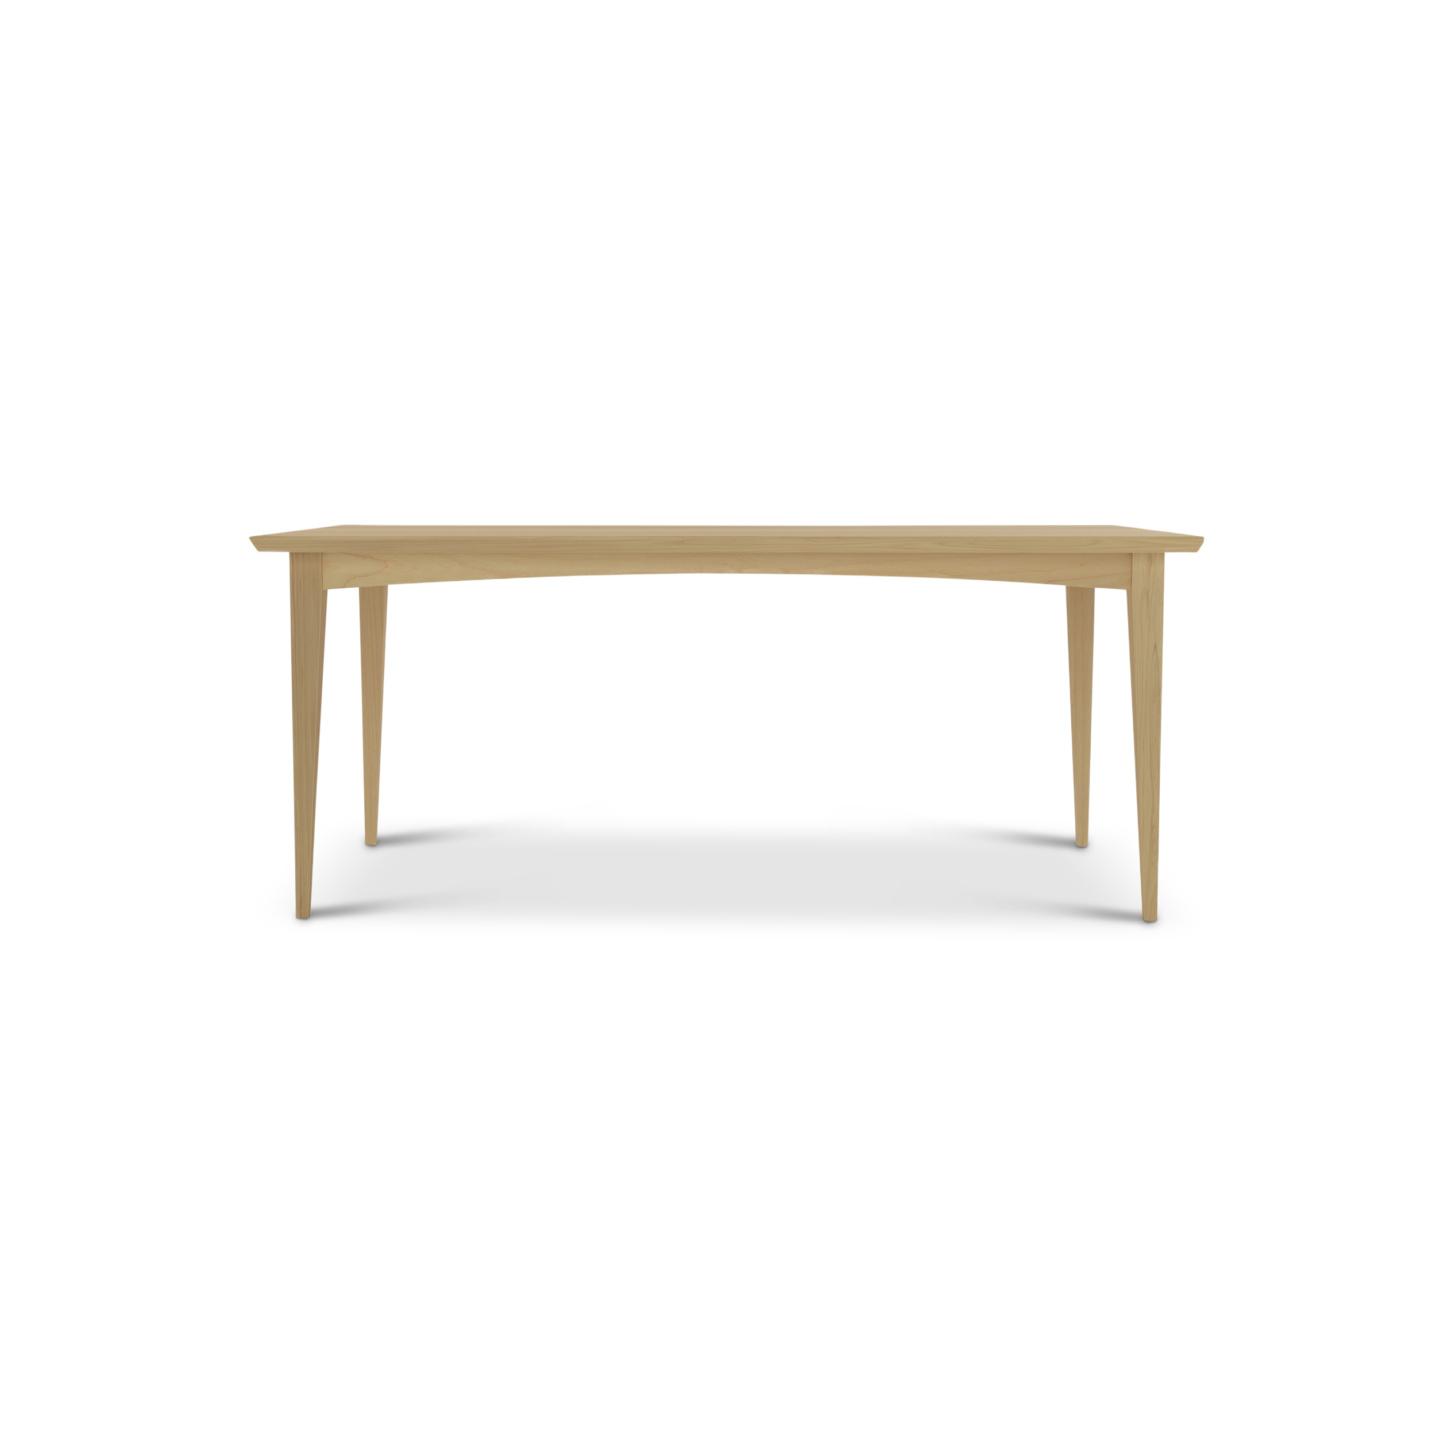 6 foot ash mid-century modern table